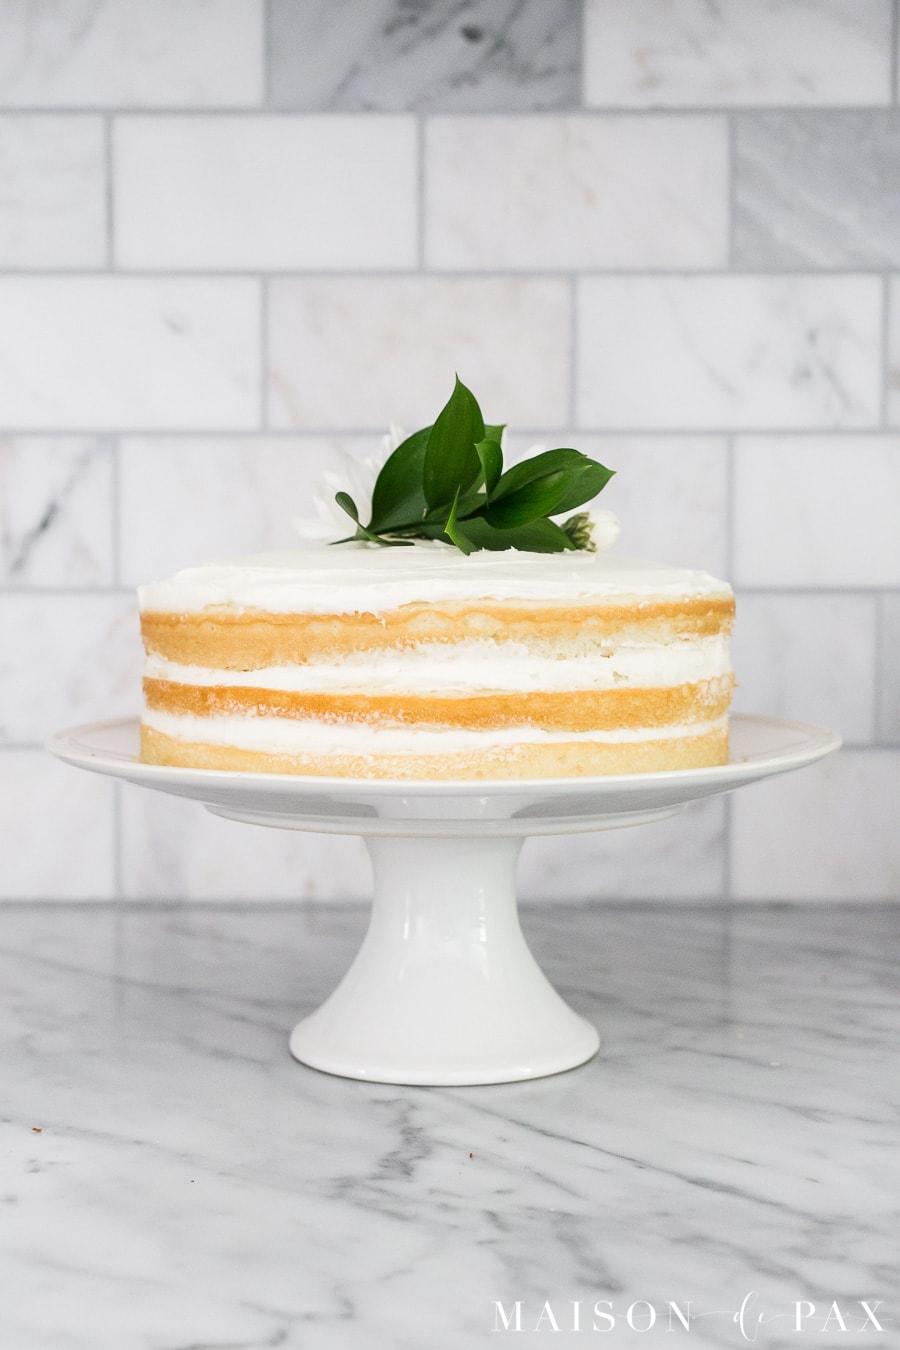 Naked Cake: Easy, beautiful dessert ideas - Maison de Pax